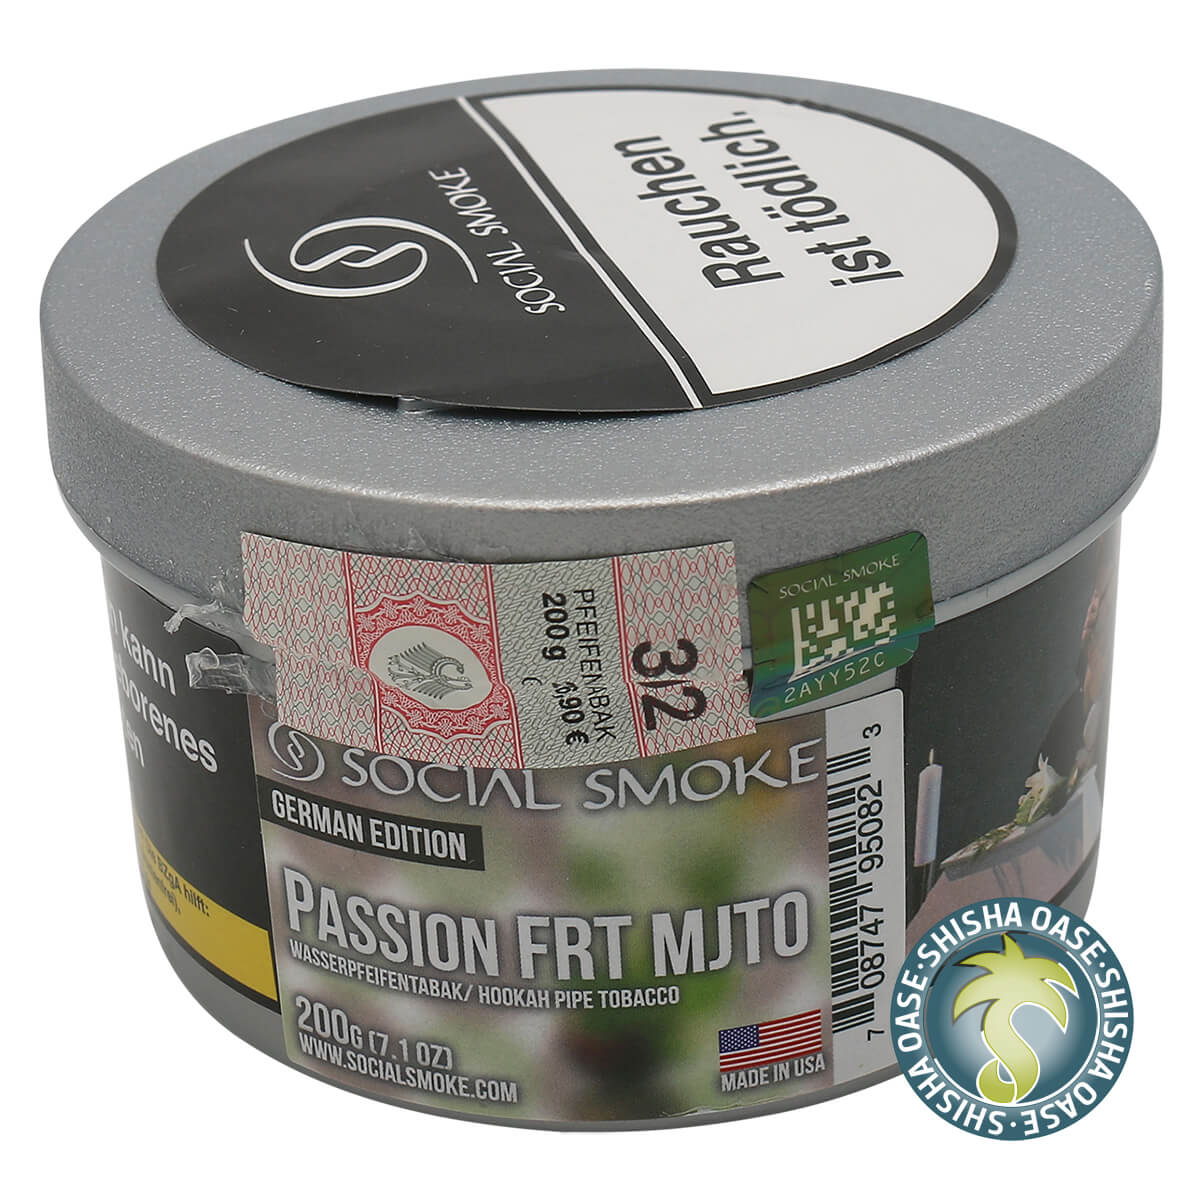 Social Smoke Tabak Passion Frt Mjto 200g Dose